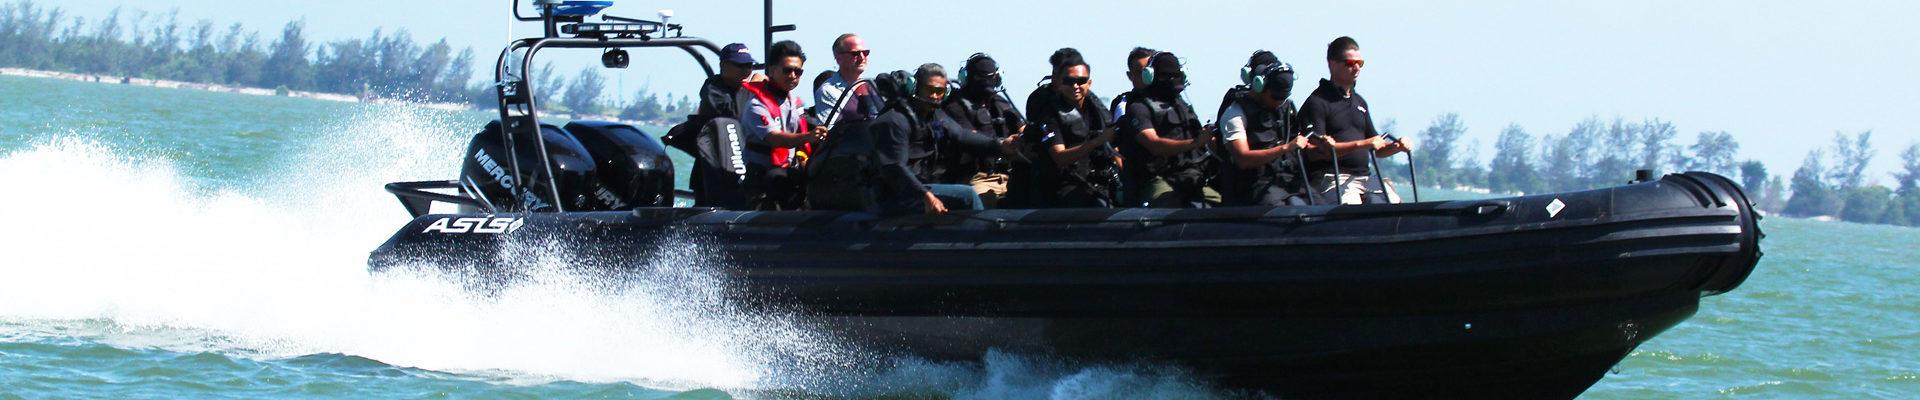 anti-piracy-rigid-inflatable-boats-1920x400